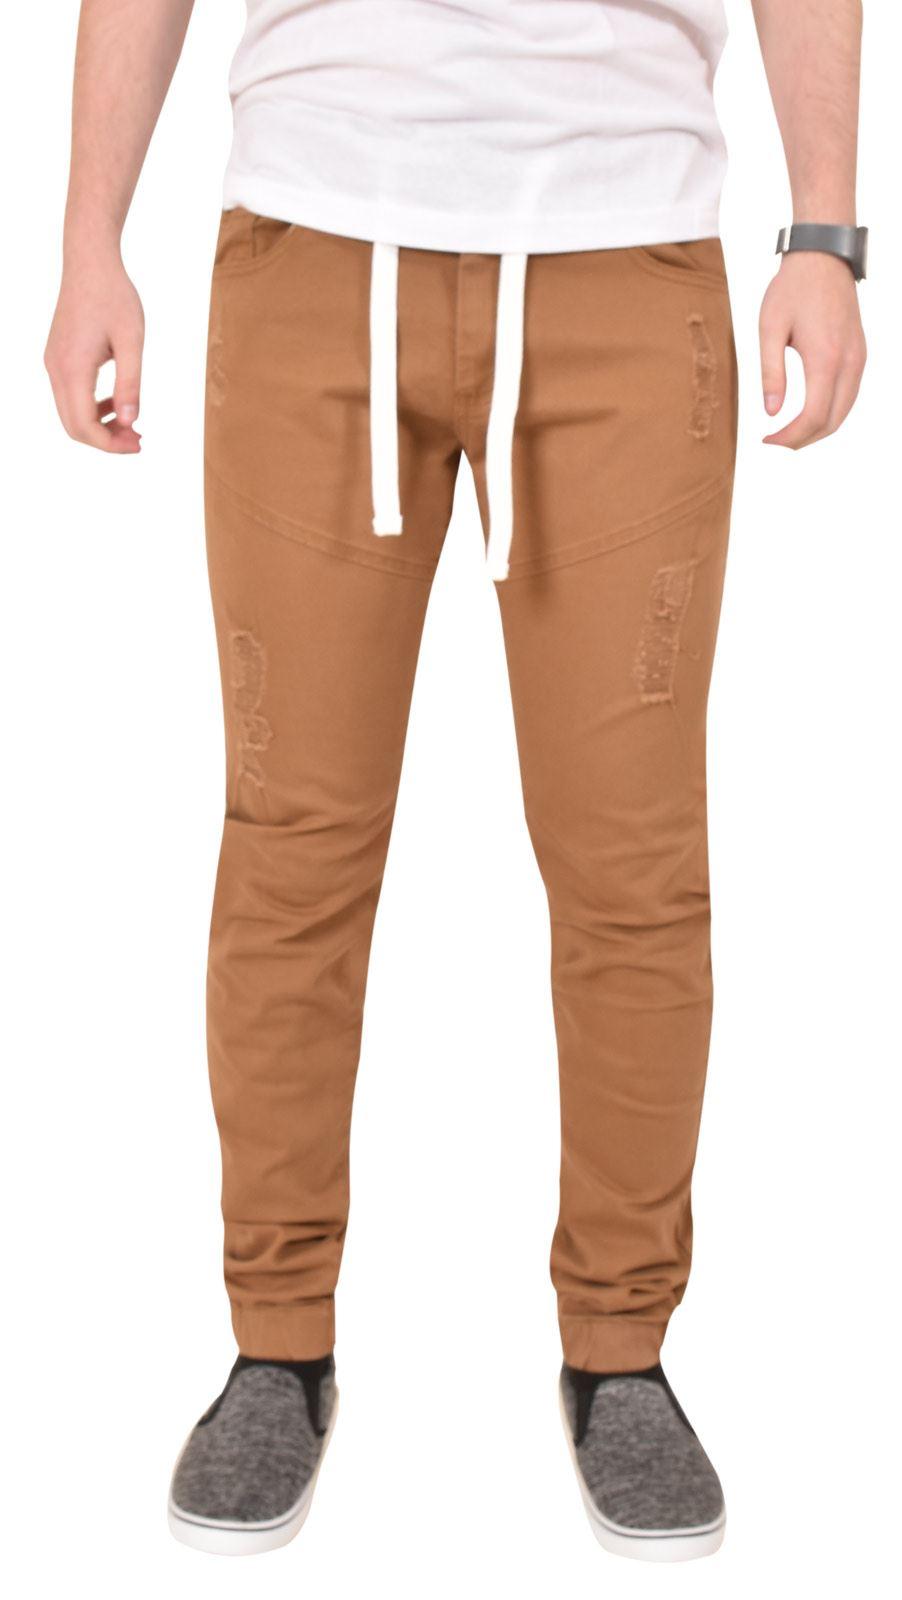 9de33568b Mens Cuffed Jeans Designer Casual Denim Chino Drawstring ENZO Ripped  Trousers